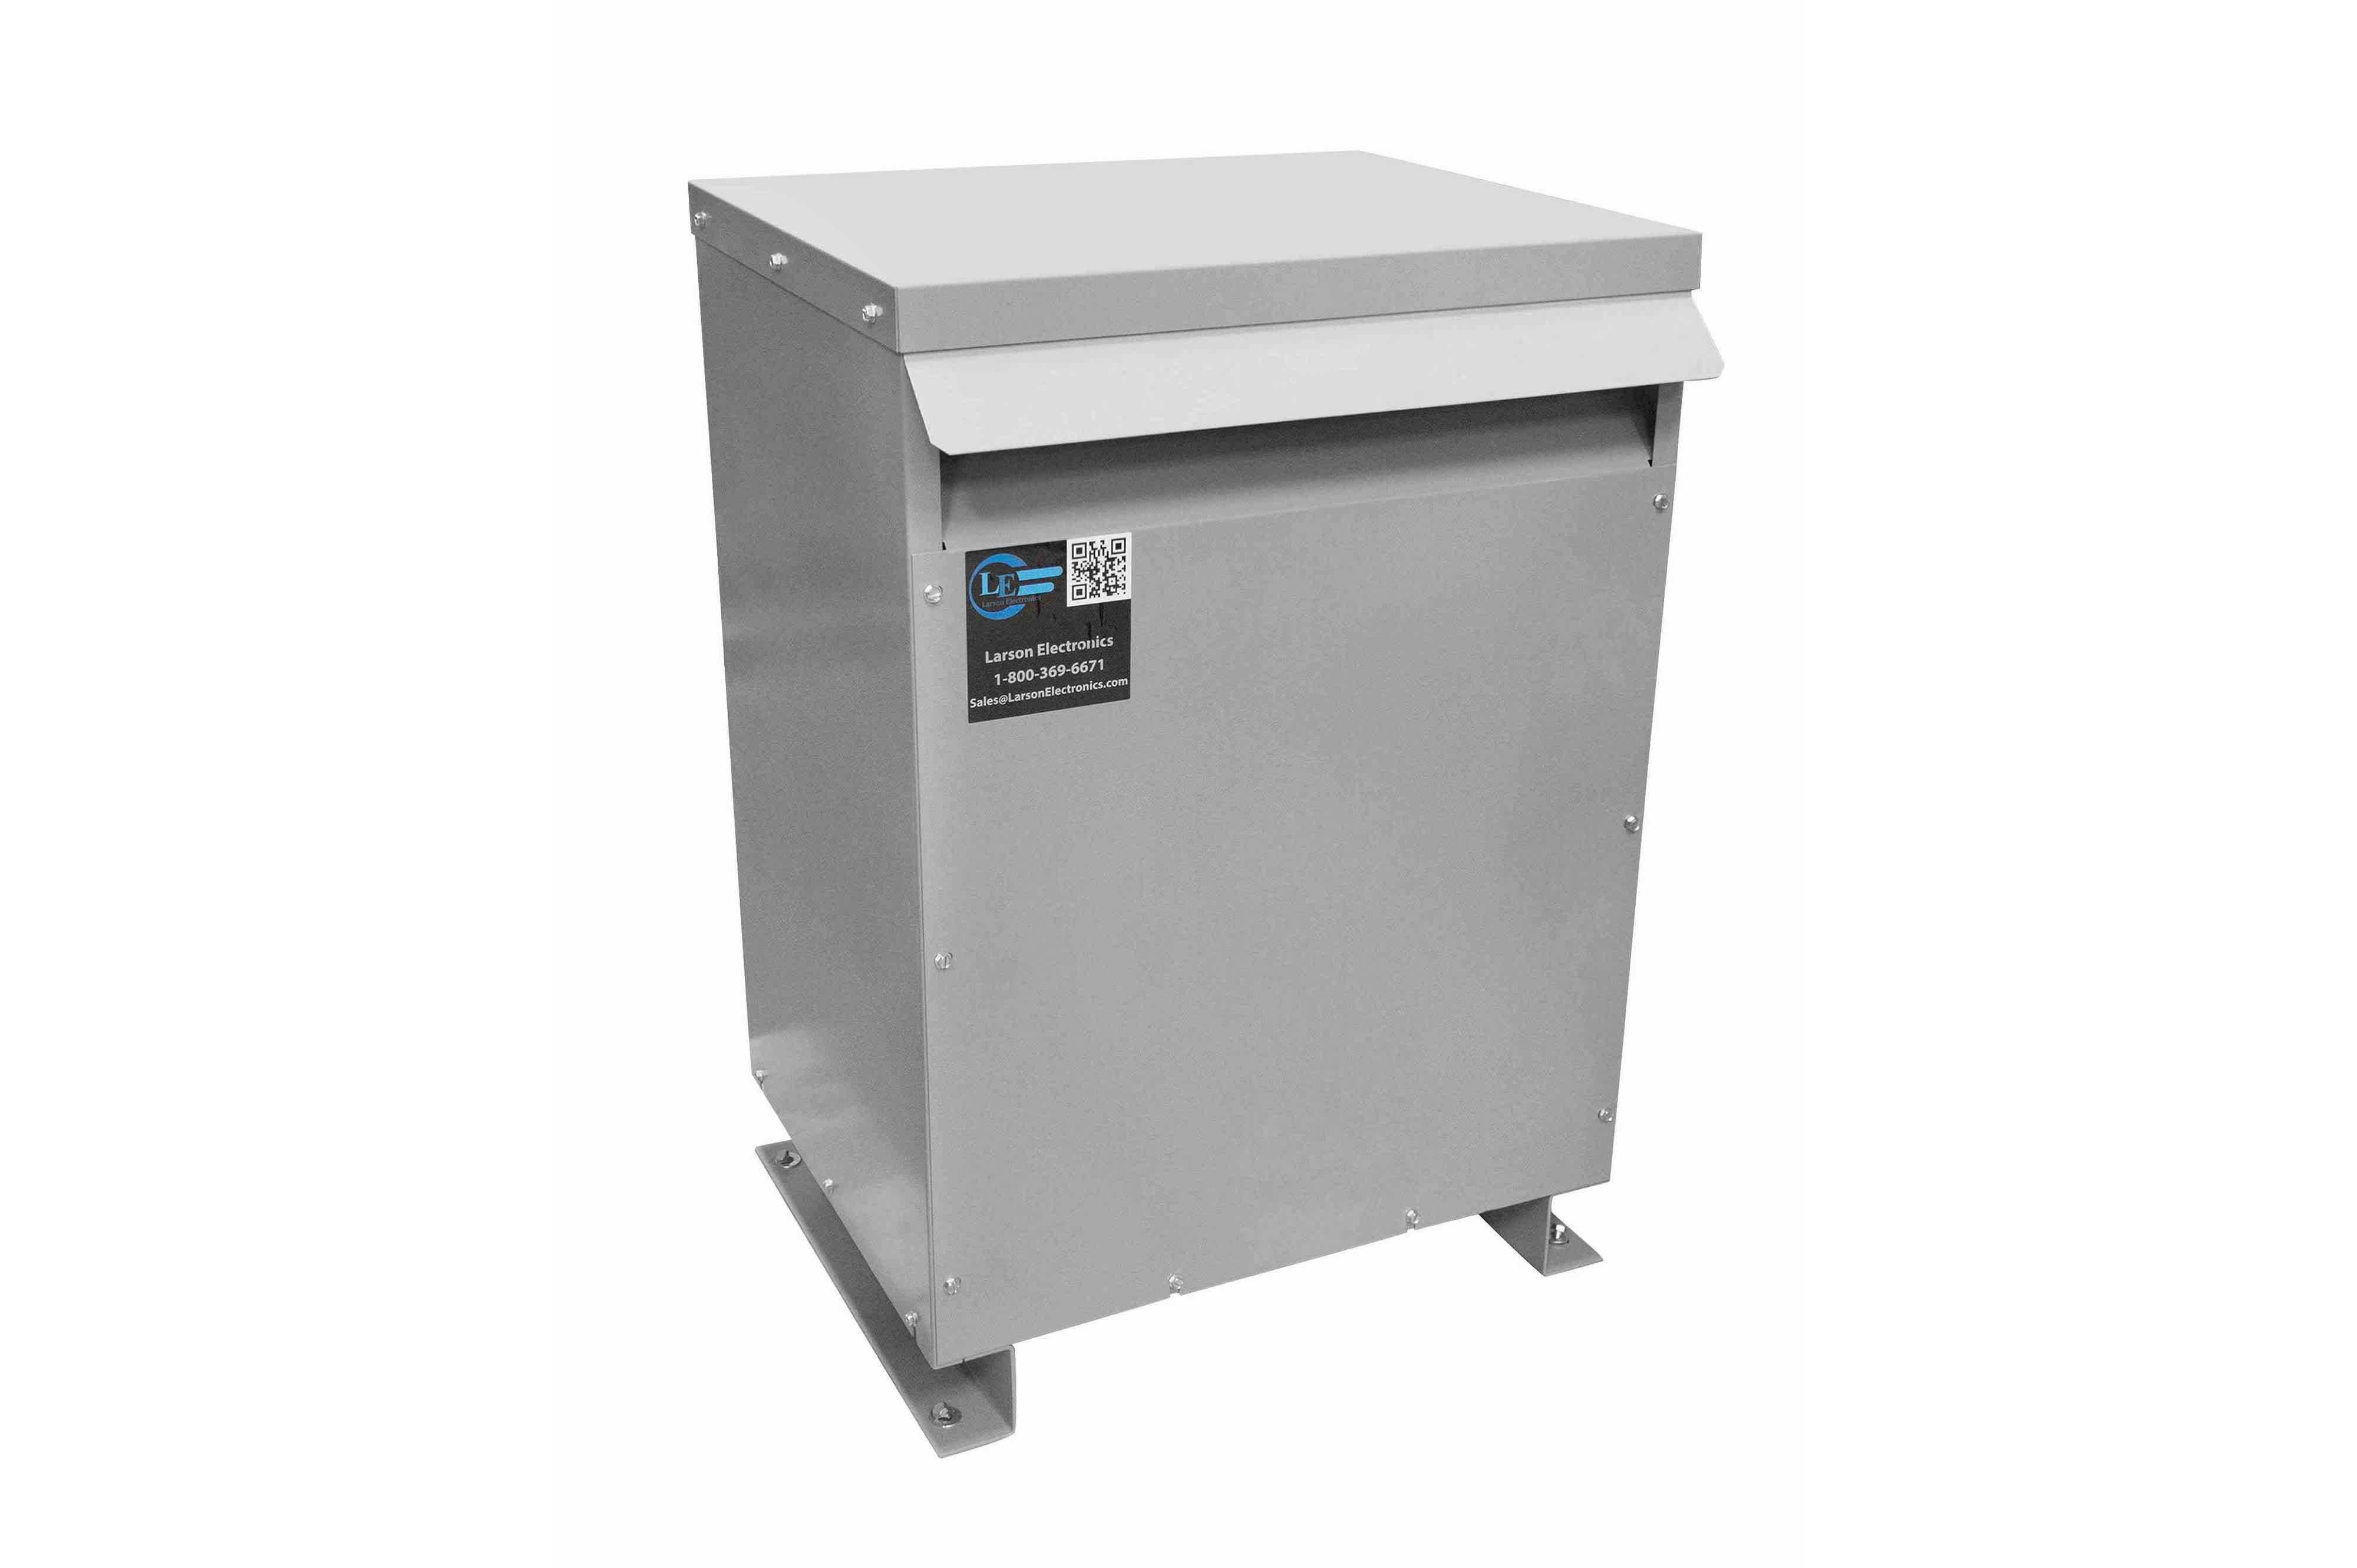 37.5 kVA 3PH Isolation Transformer, 208V Wye Primary, 415V Delta Secondary, N3R, Ventilated, 60 Hz